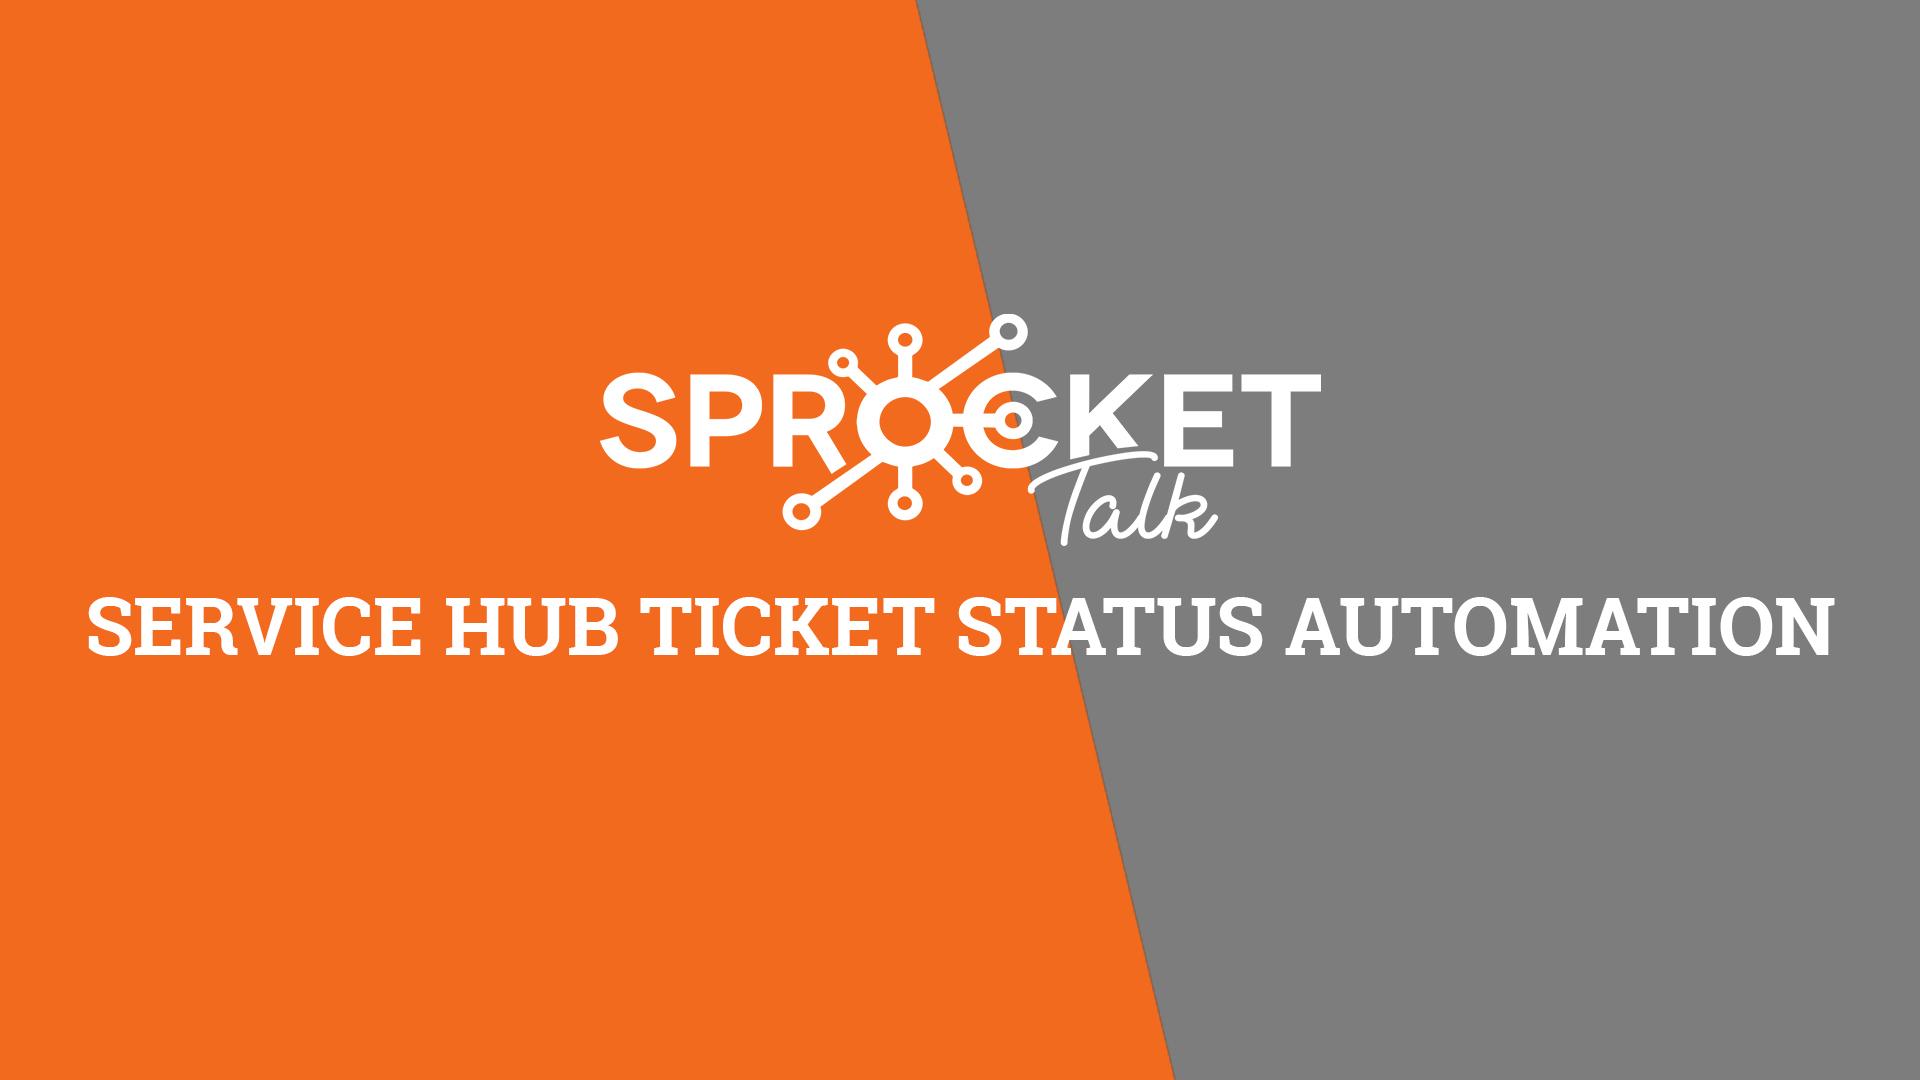 Service Hub Ticket Status Automation